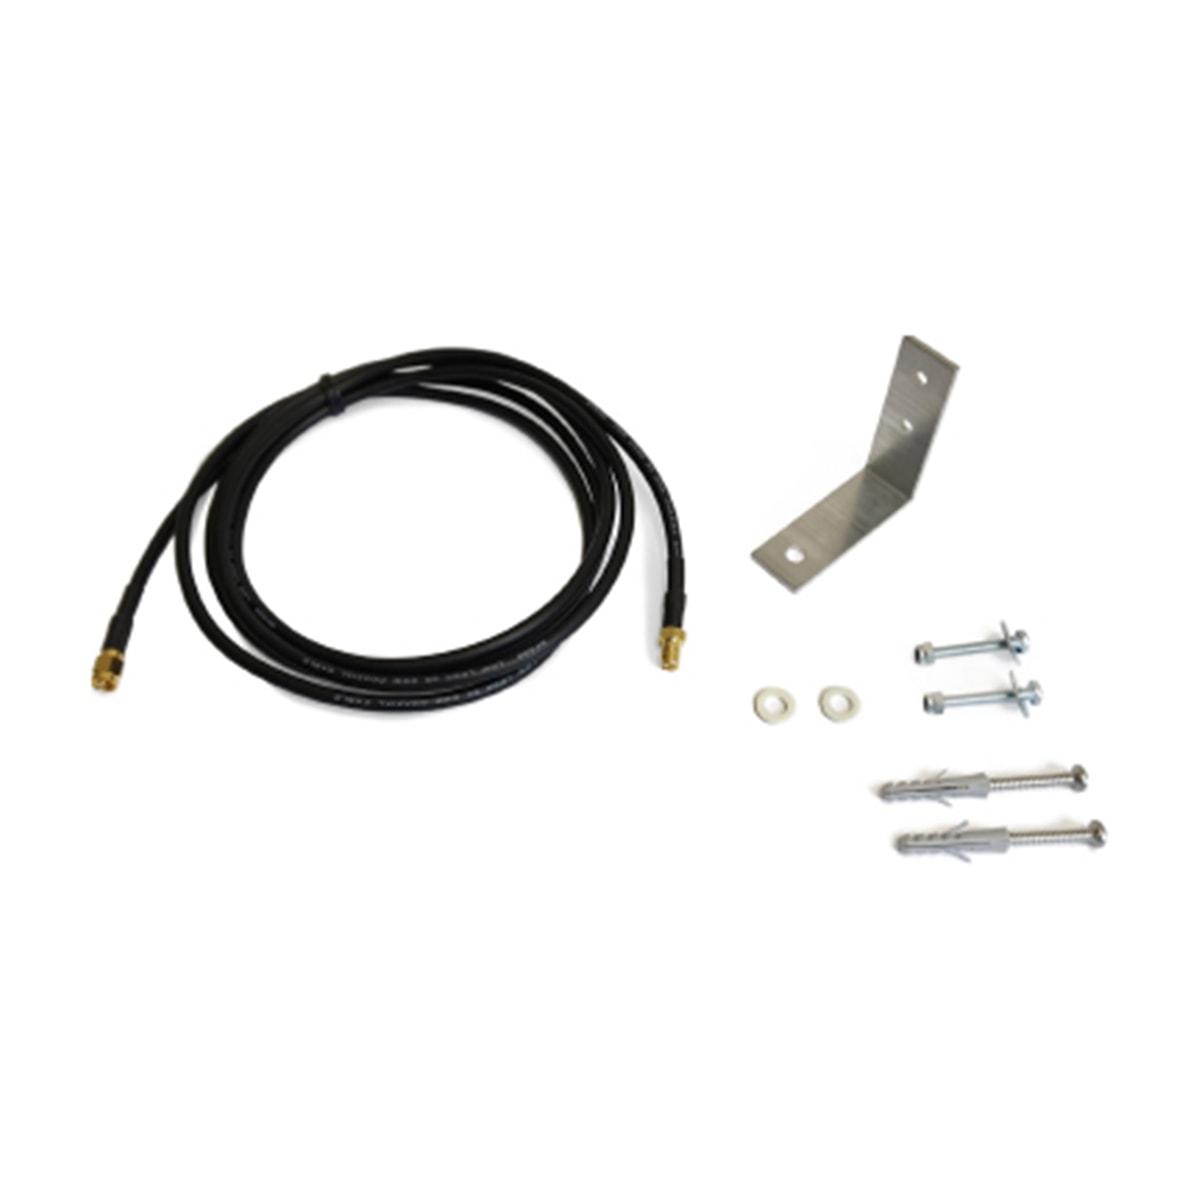 RF-TXRA - Radio Frequency Remote Antenna Kit